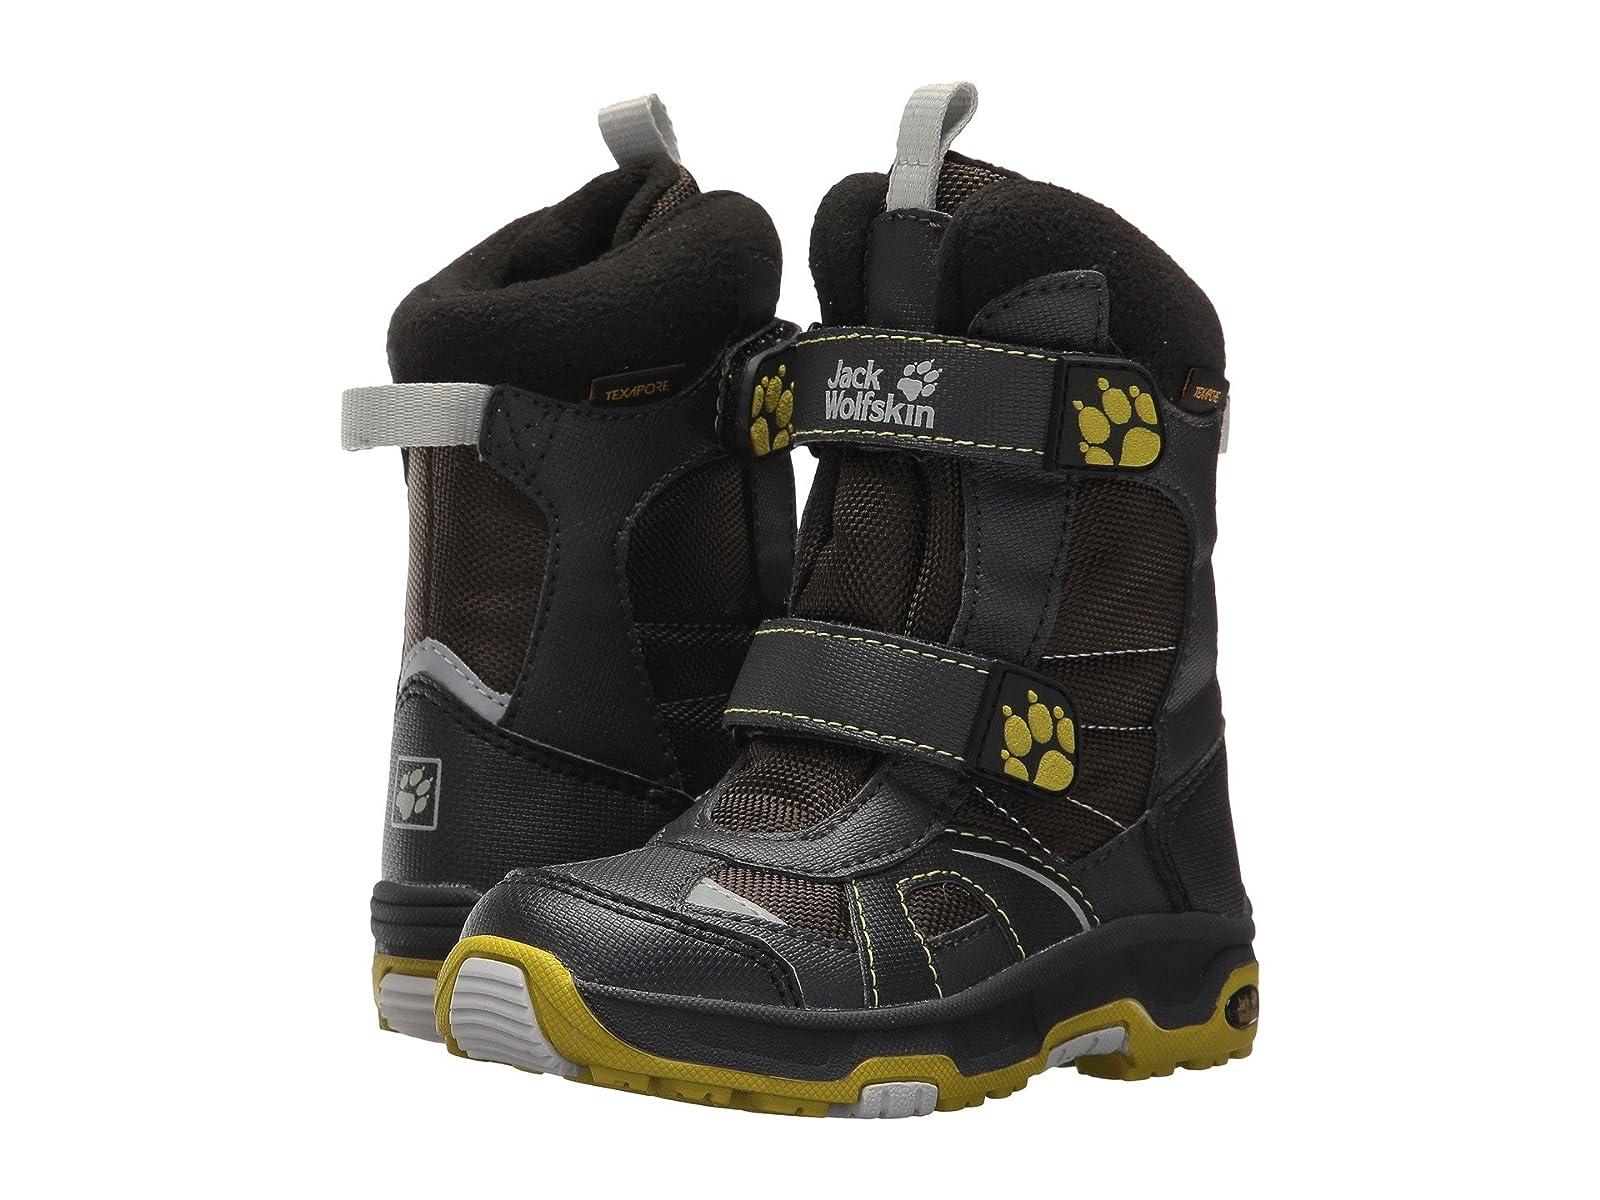 Jack Wolfskin Kids Polar Bear Waterproof (Toddler/Little Kid/Big Kid)Affordable and distinctive shoes